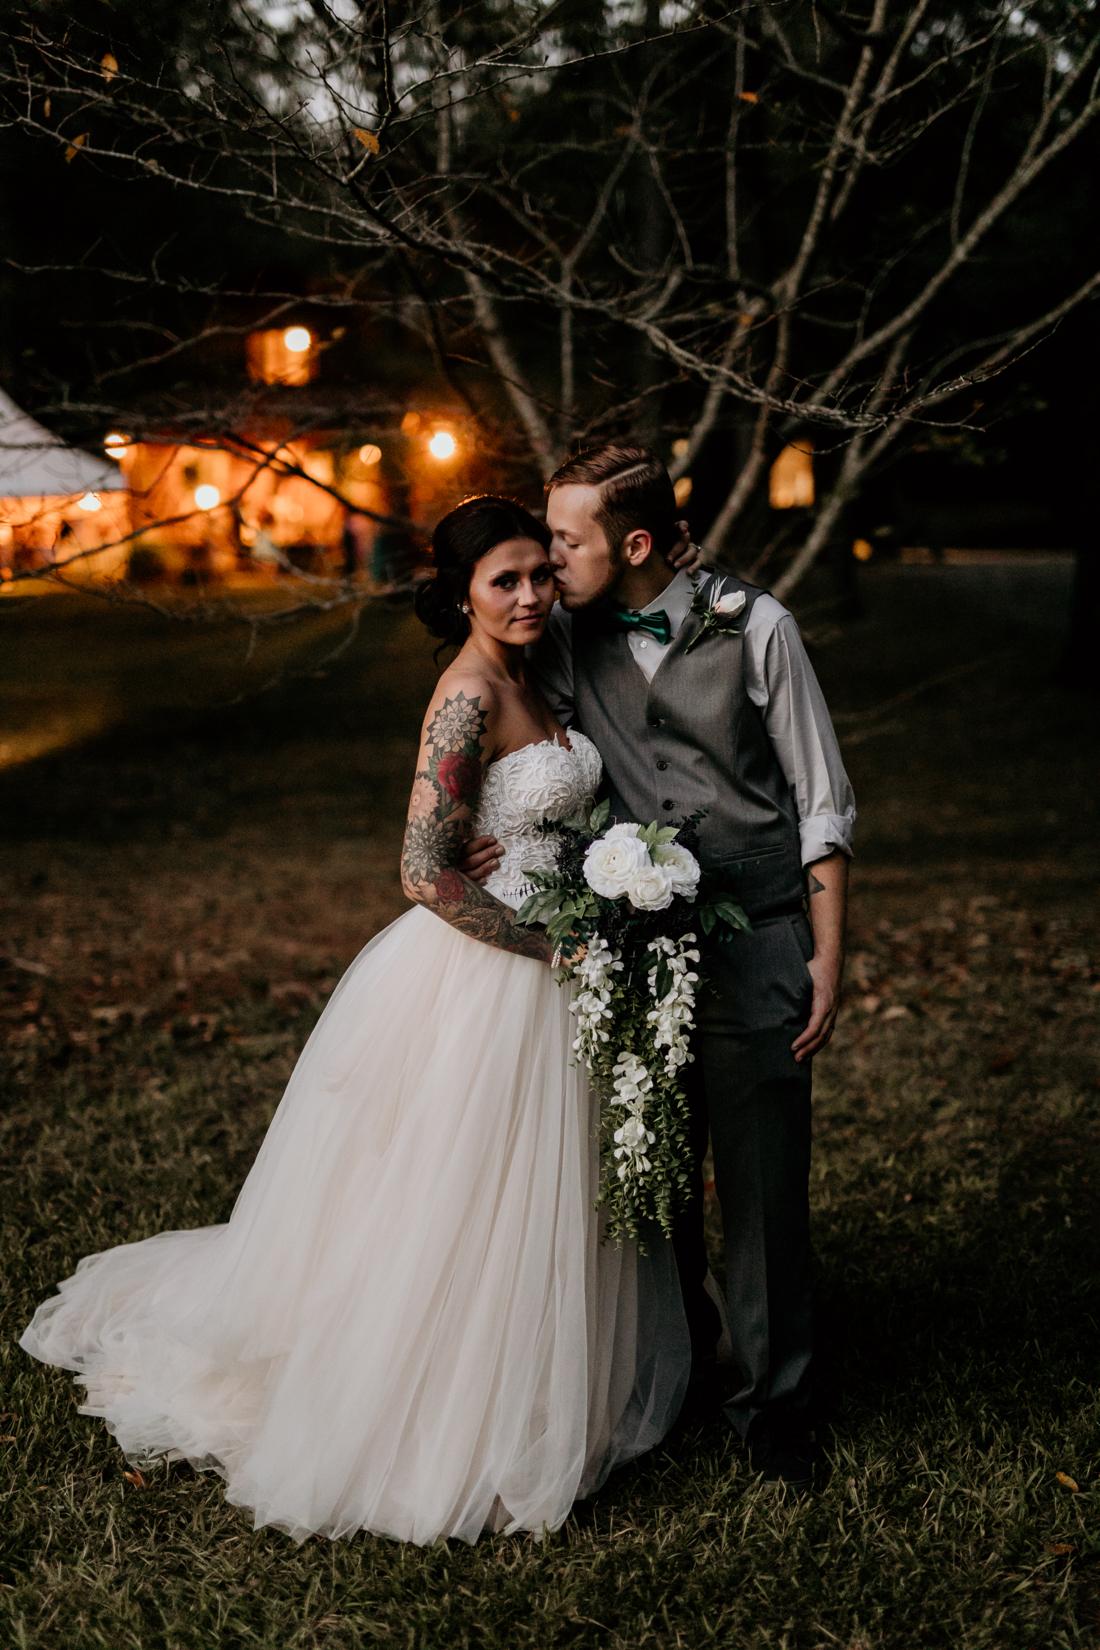 olivia_zay_wedding_09_2018-9848.jpg